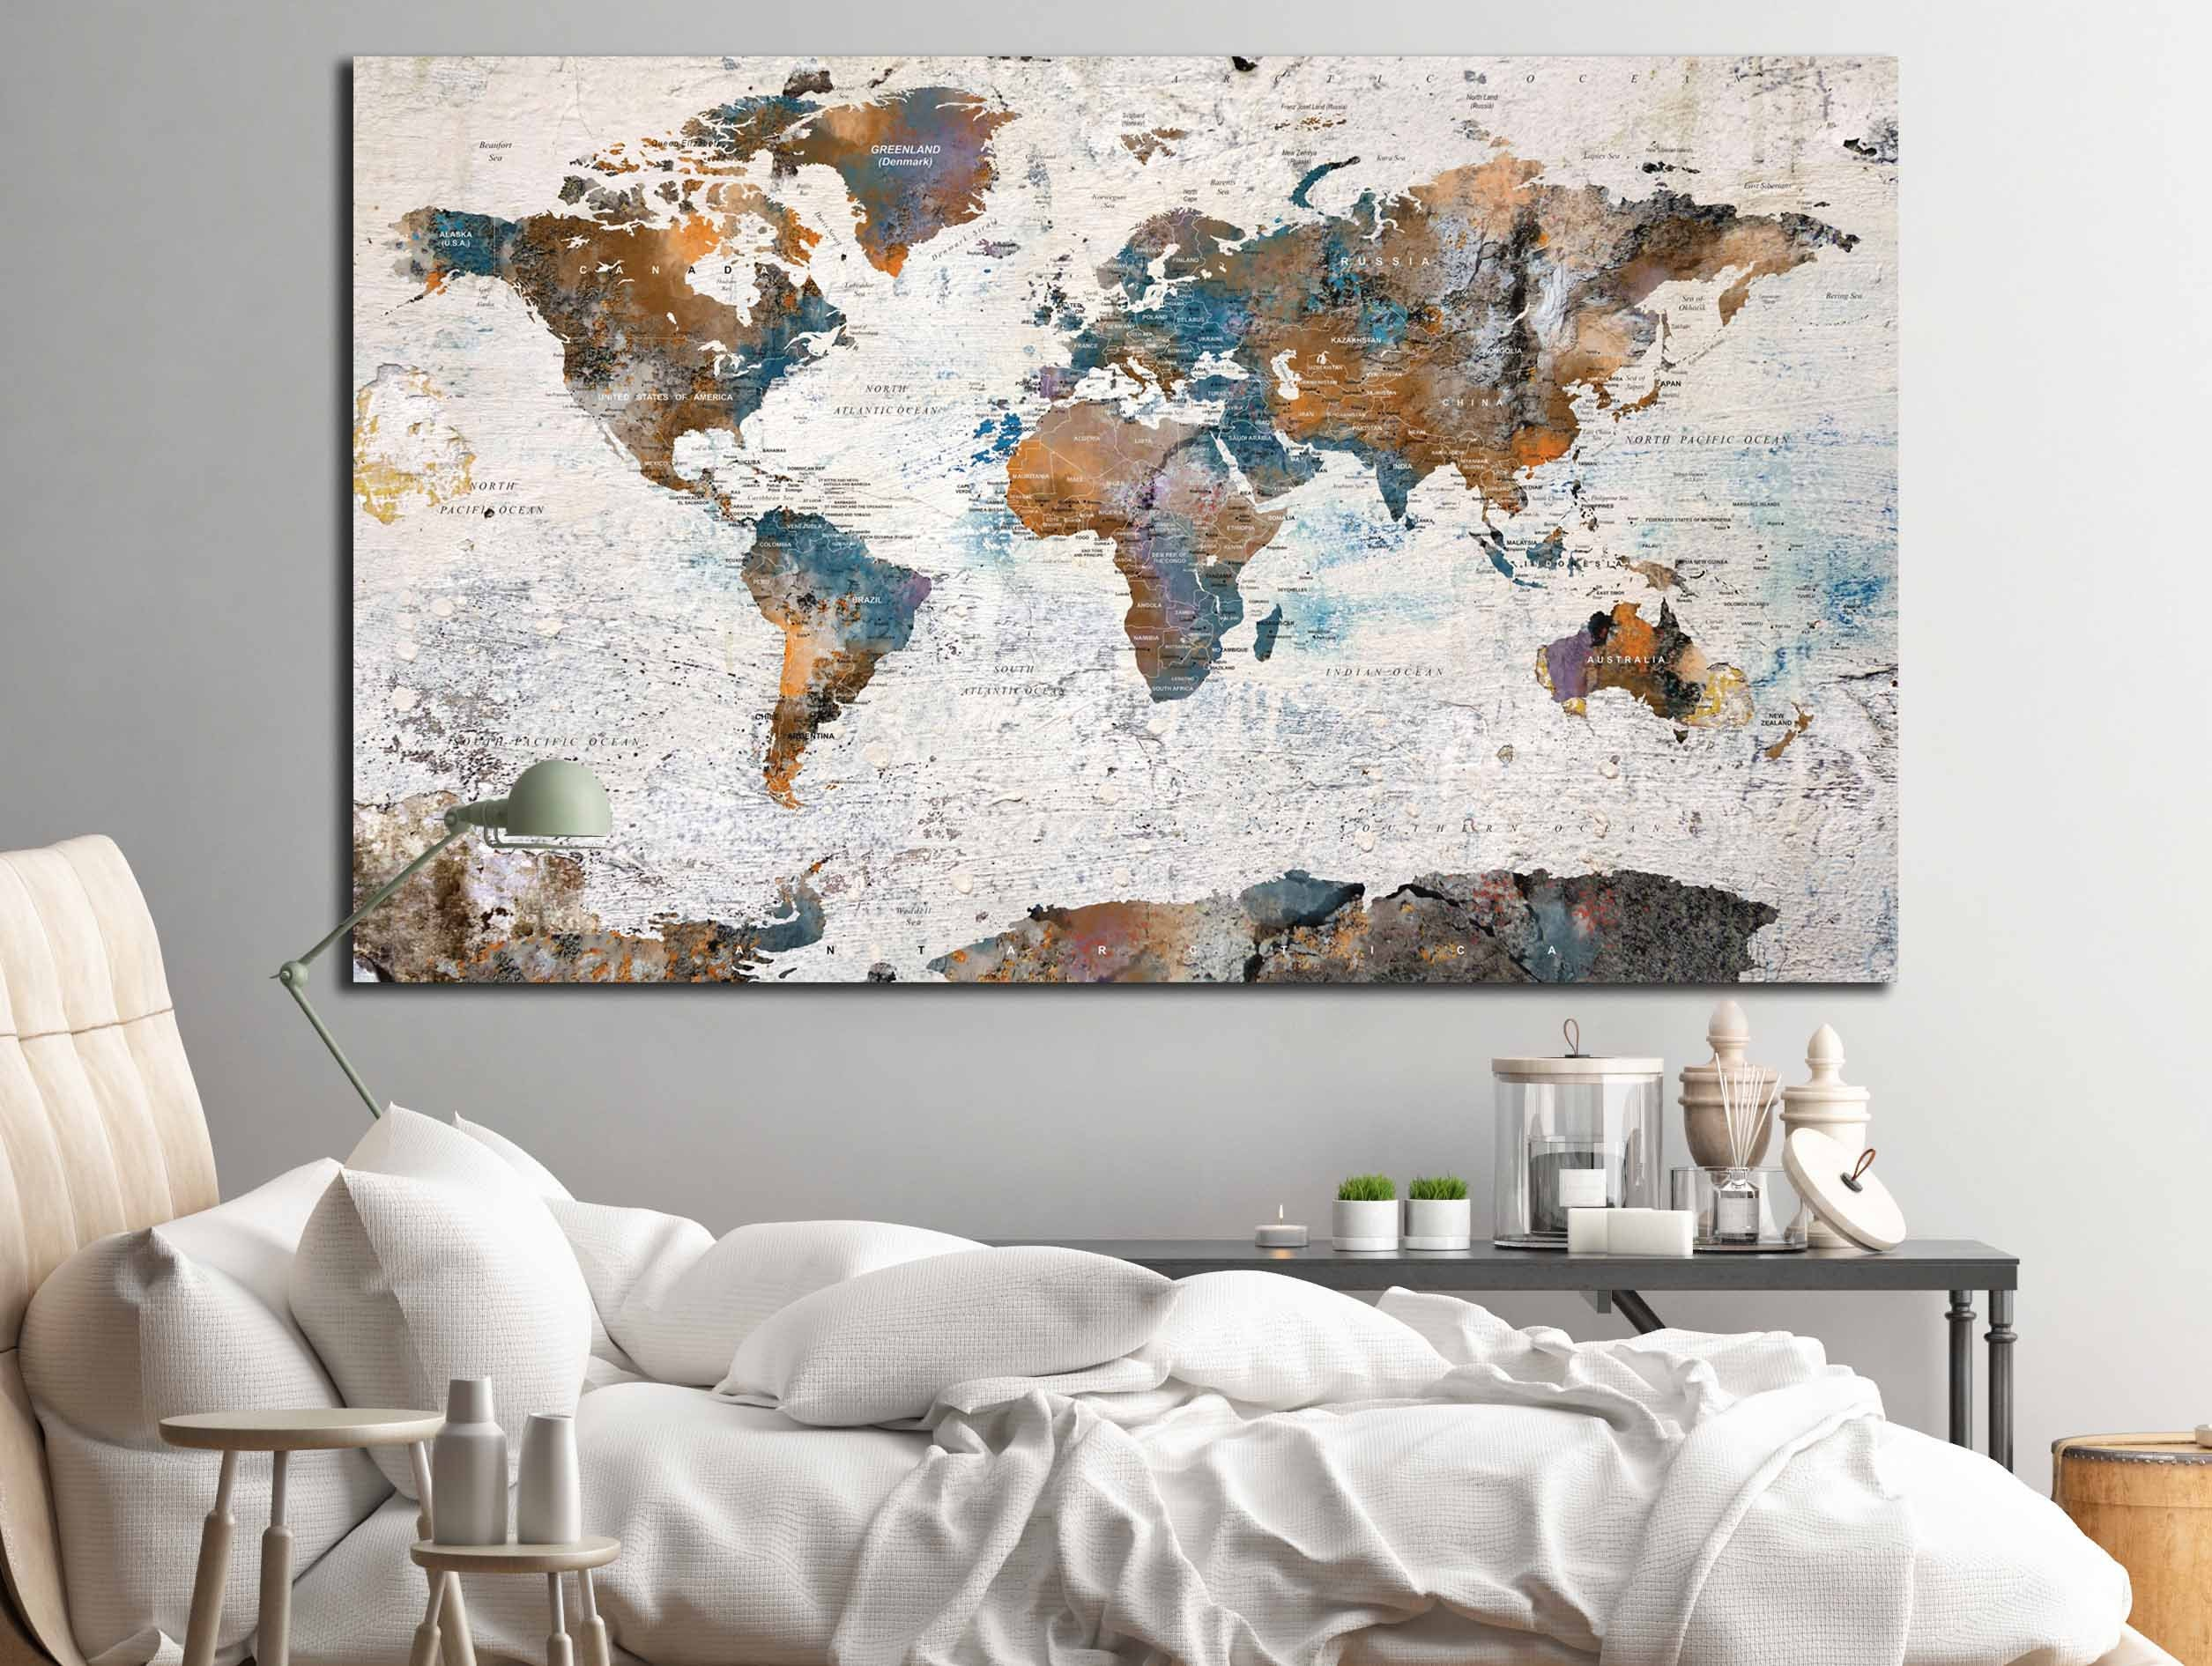 World map canvas single panelworld map wall artworld mappush pin largeworld map abstract art gallery photo gallery photo gallery photo gallery photo gumiabroncs Gallery